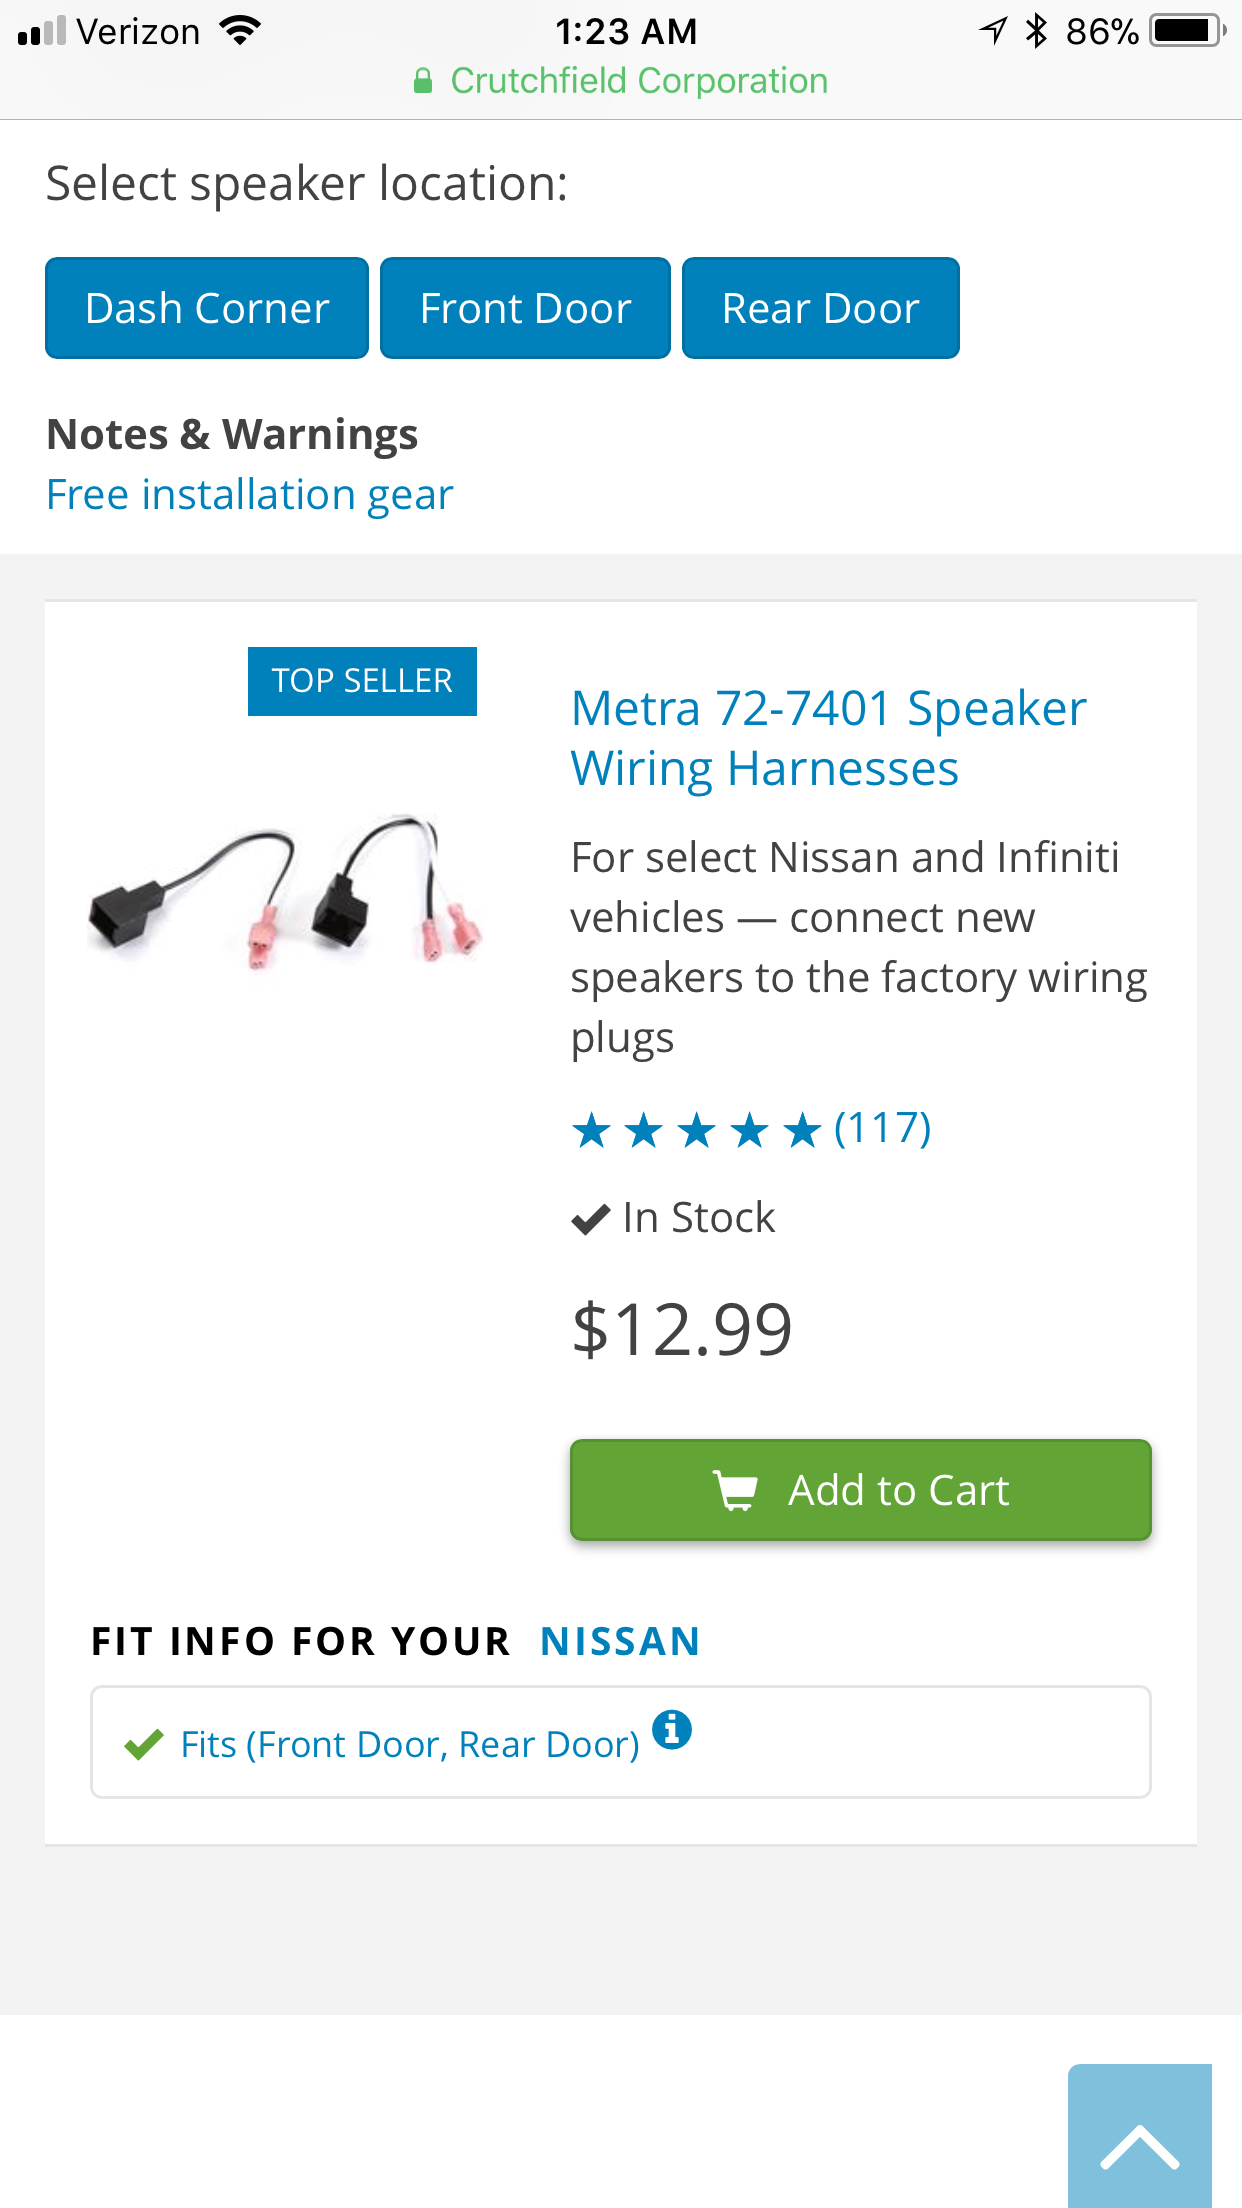 2017 Nissan Titan Factory Speakers Replacement-a06c5fbc-b6c0-49f0-9a69-84baea2e26b4_1518341119306.png